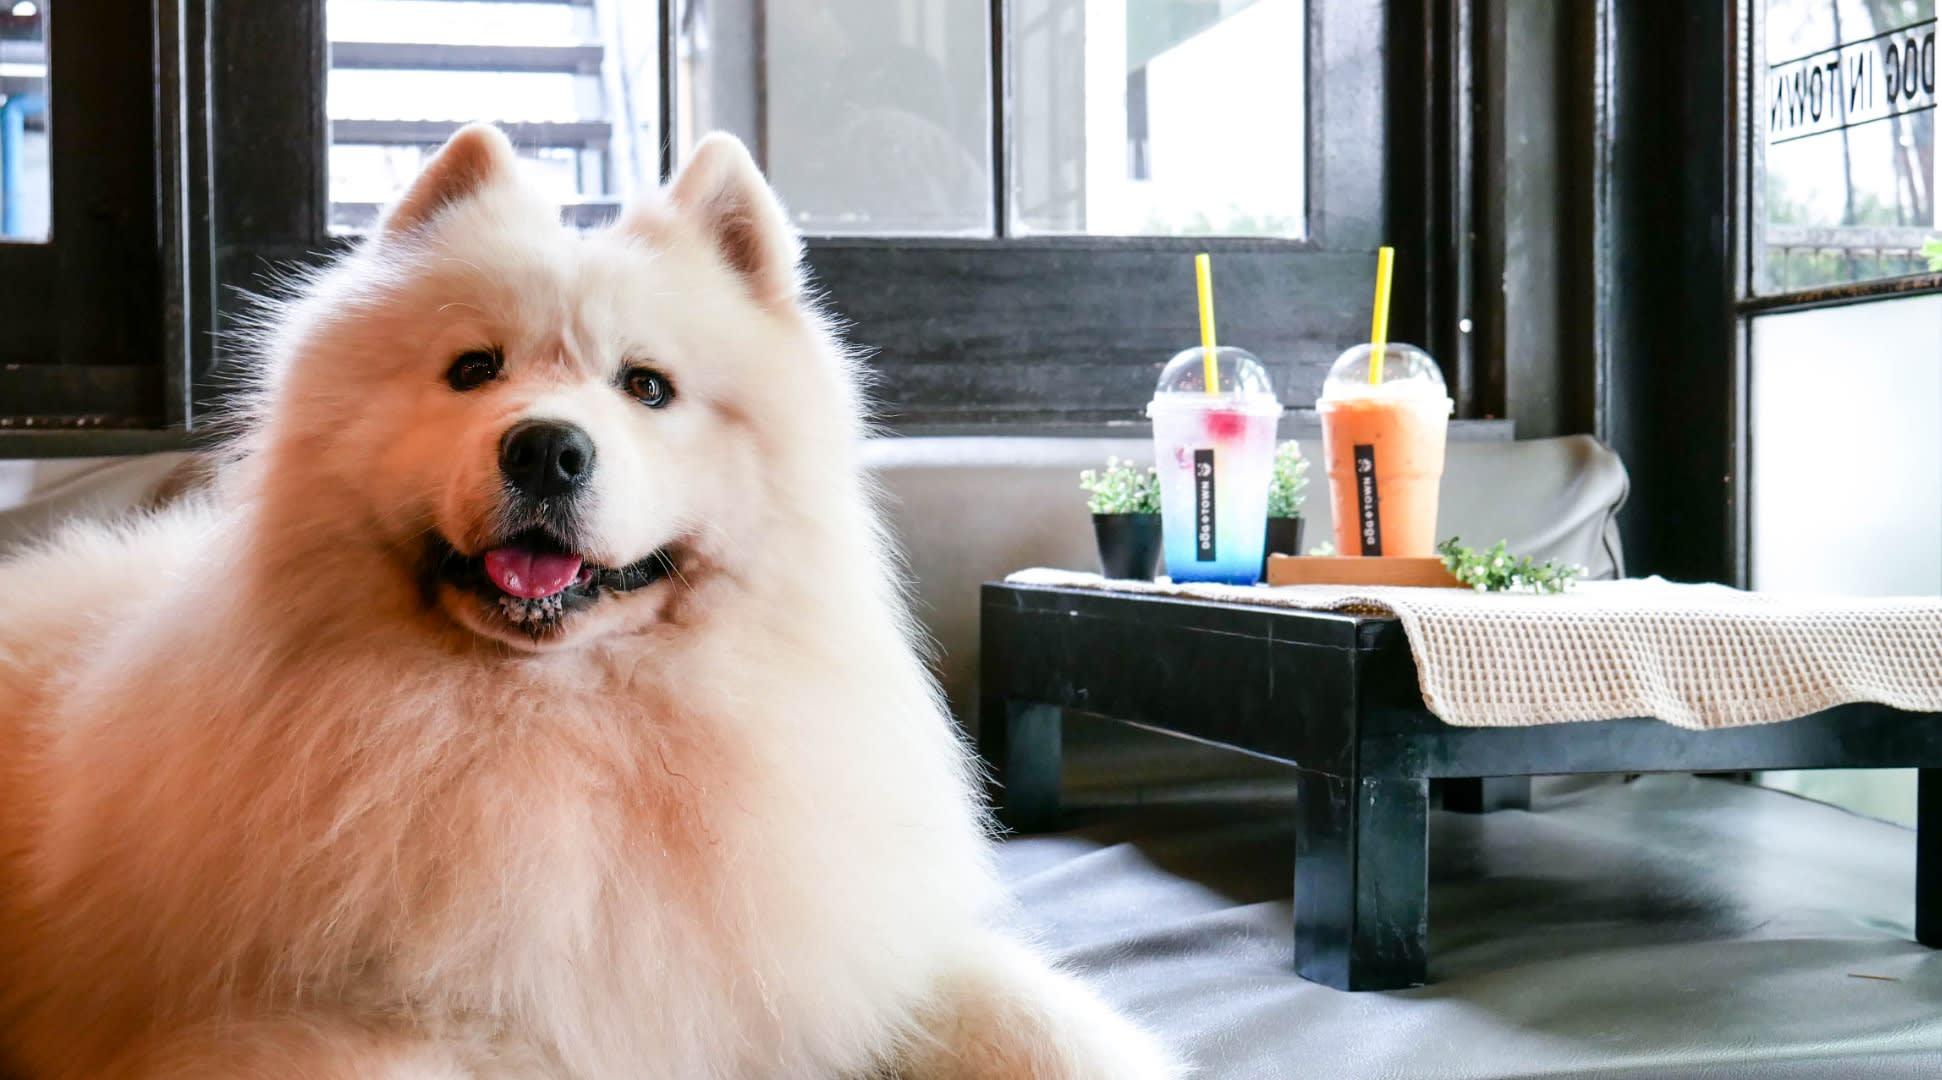 bangkok-BTS-guide-dog-in-town